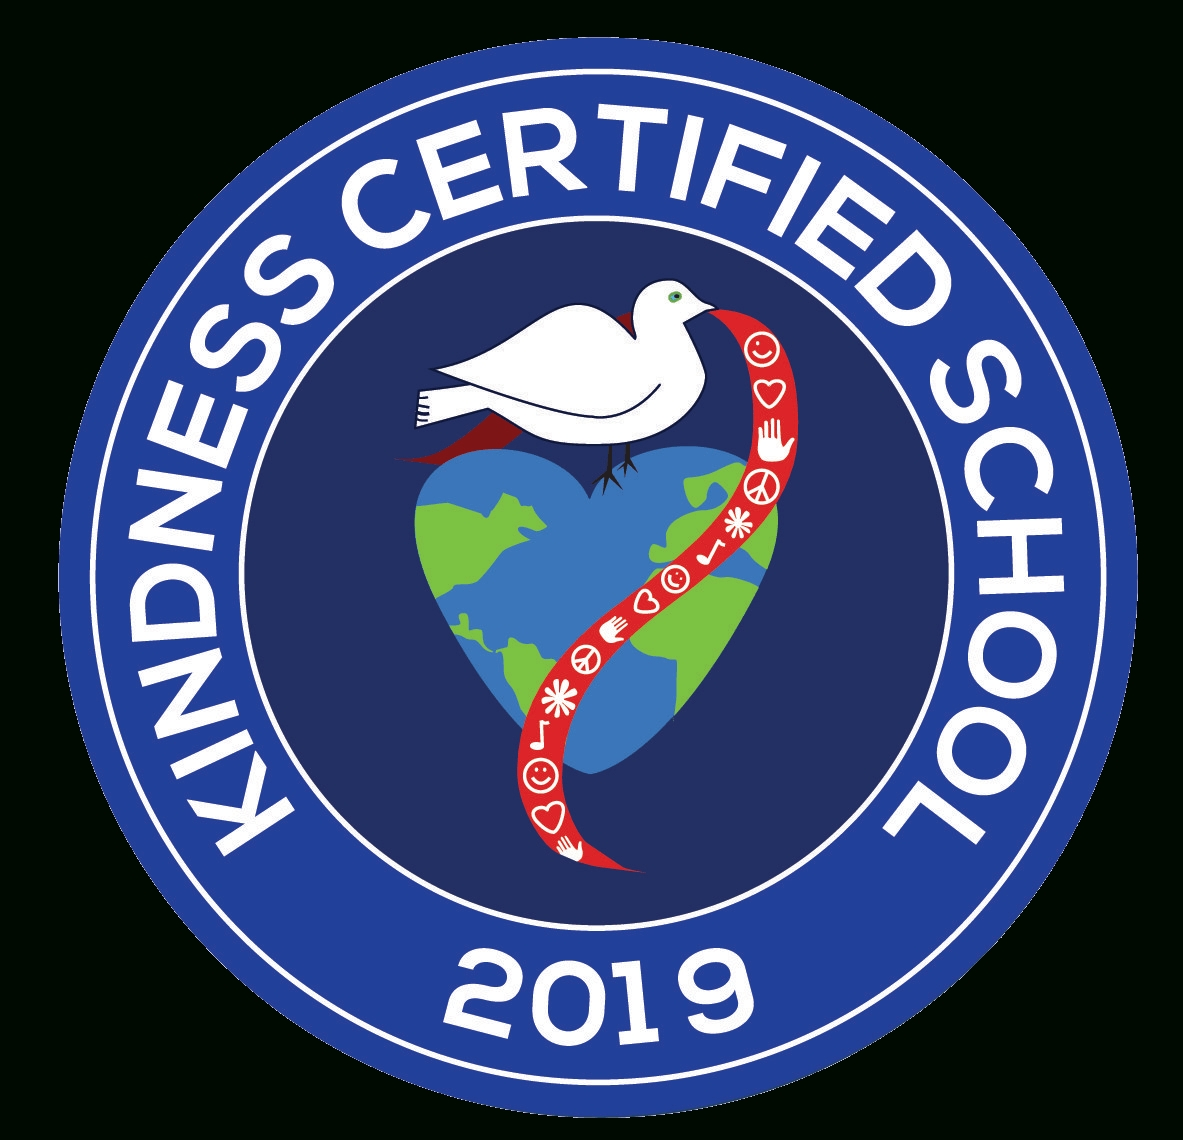 Lexington-Richland School District 5 / Homepage Lex Rich 5 Calendar 2019